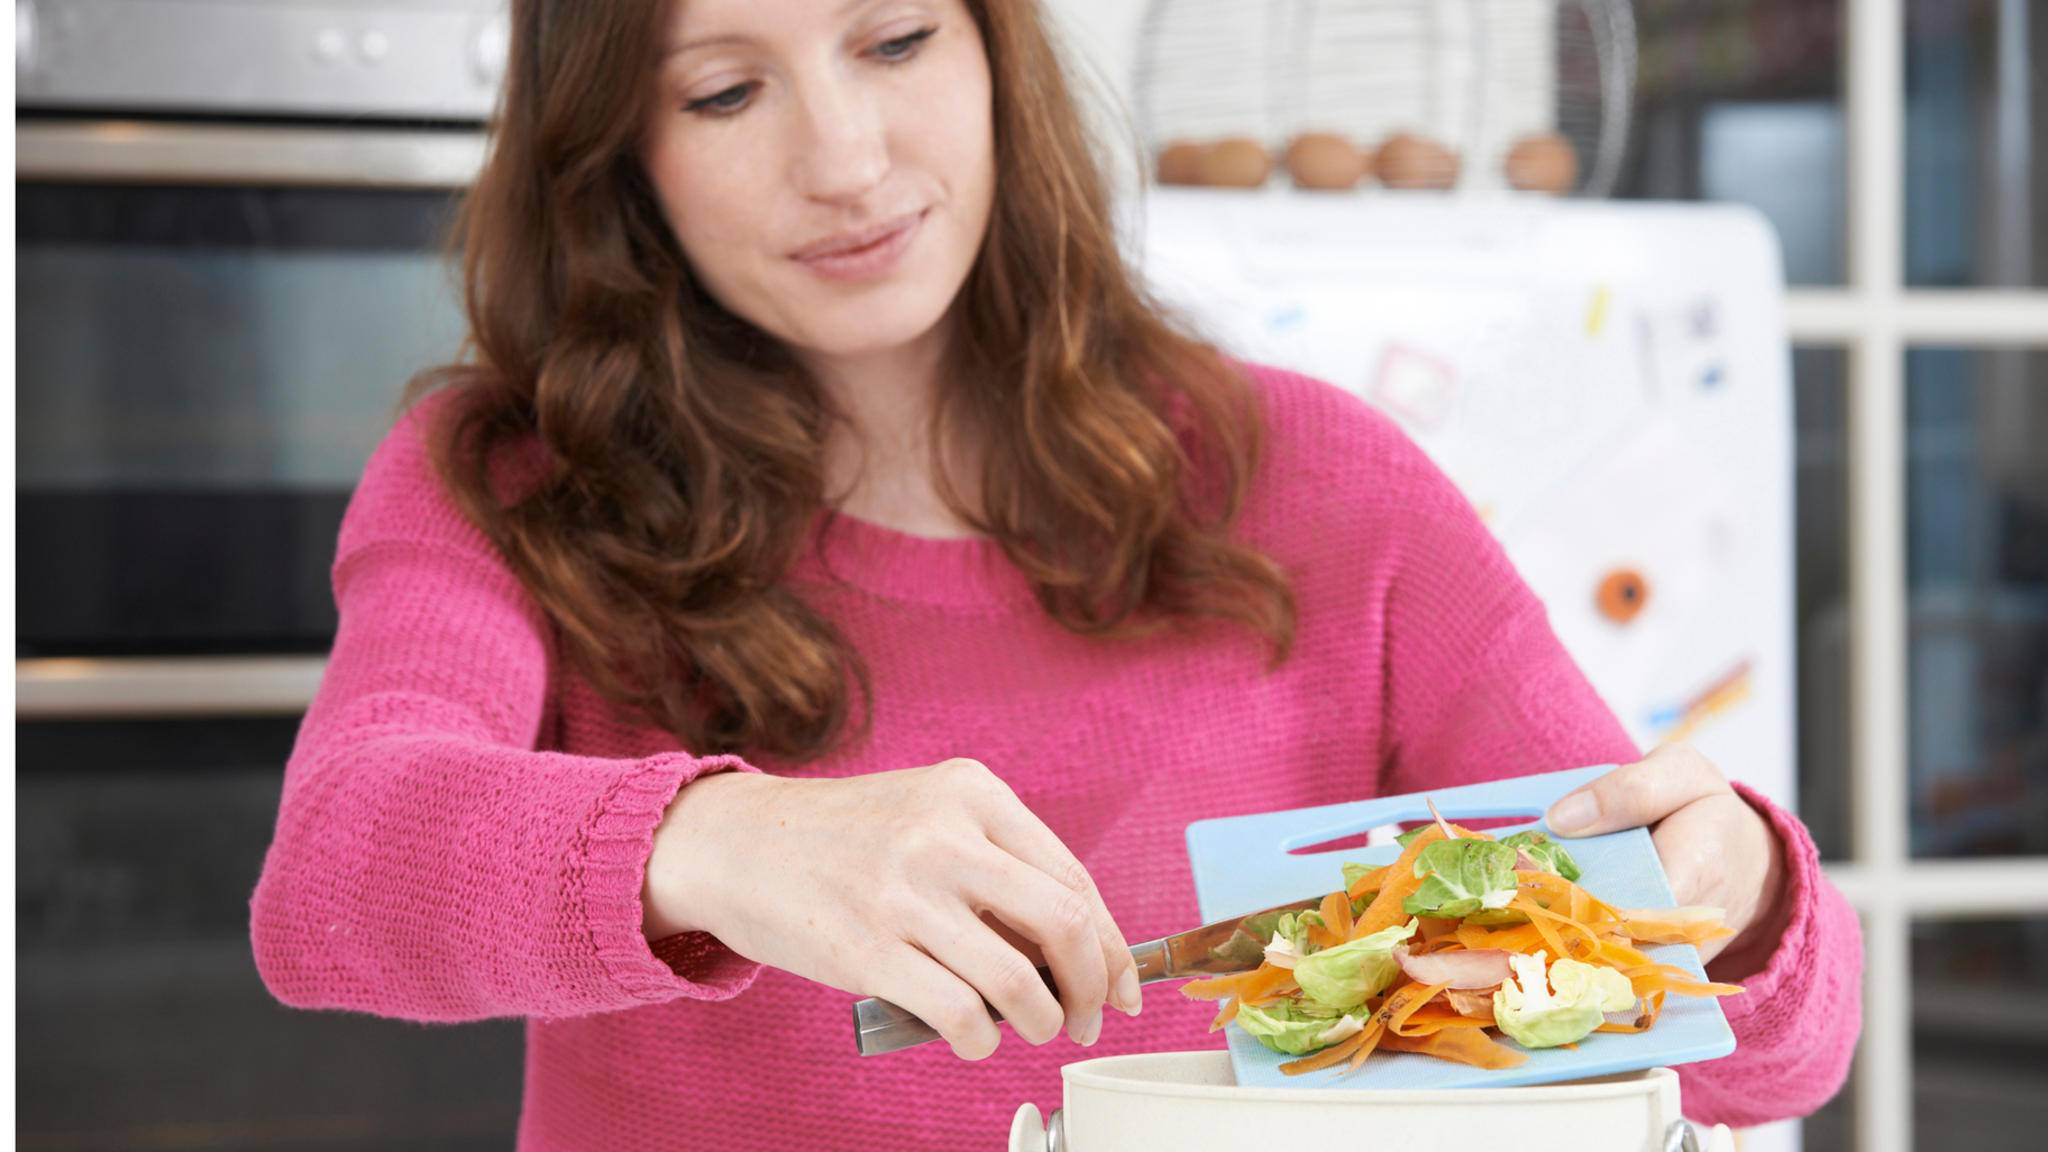 Küchenabfälle können sinnvoll kompostiert werden.